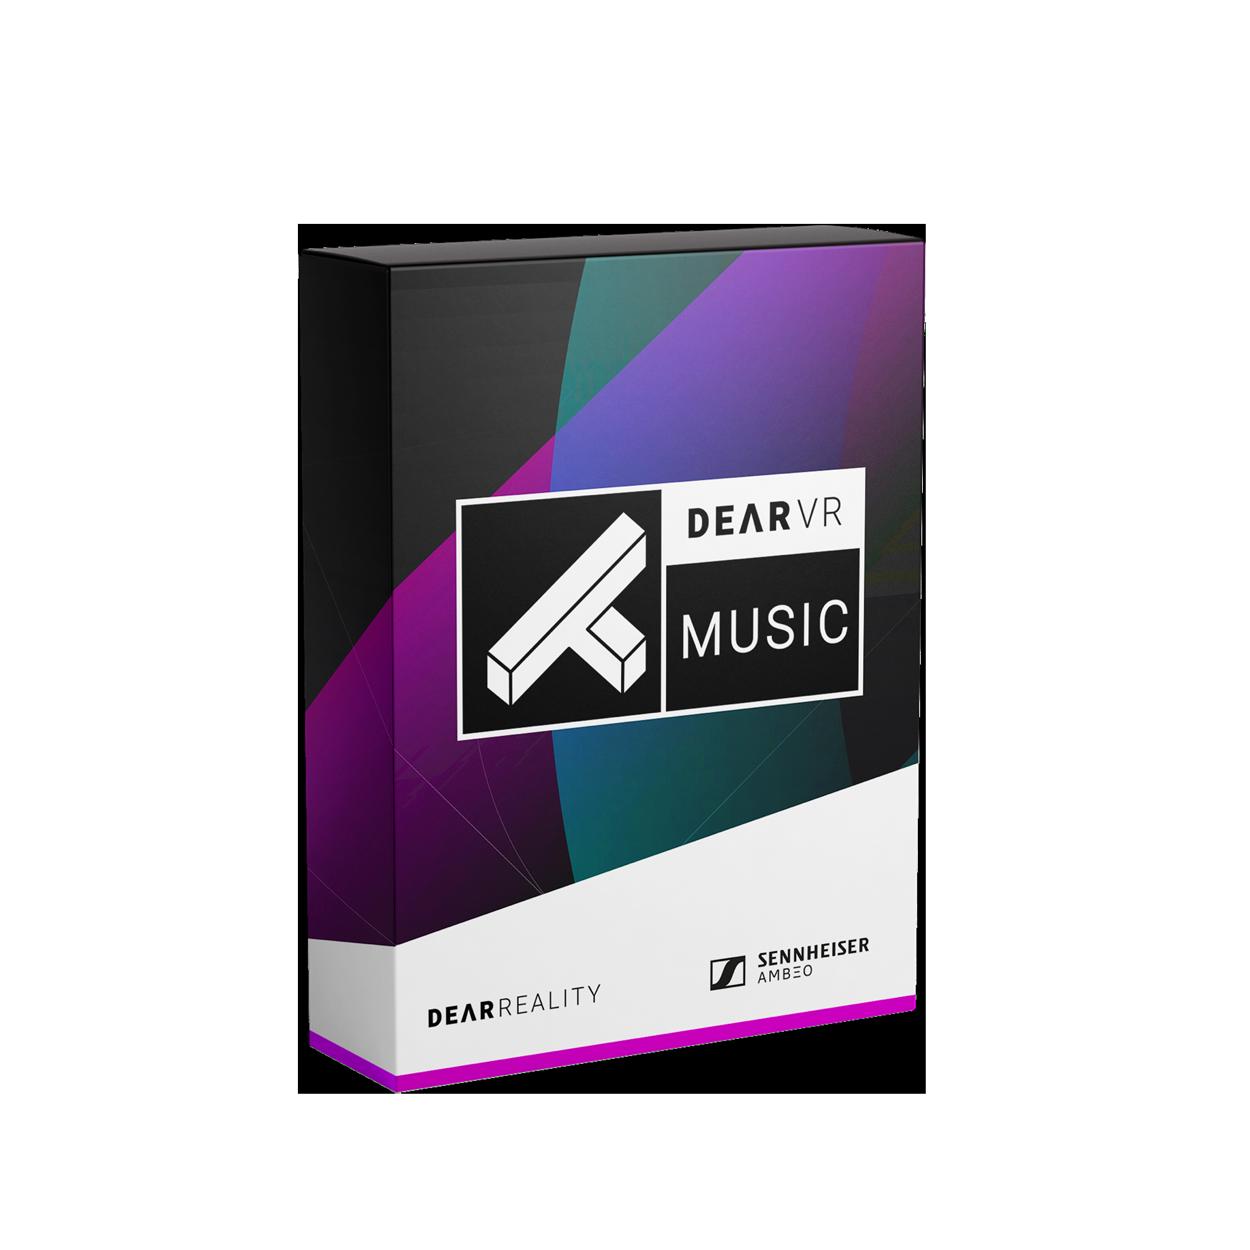 dearVR MUSIC packshot